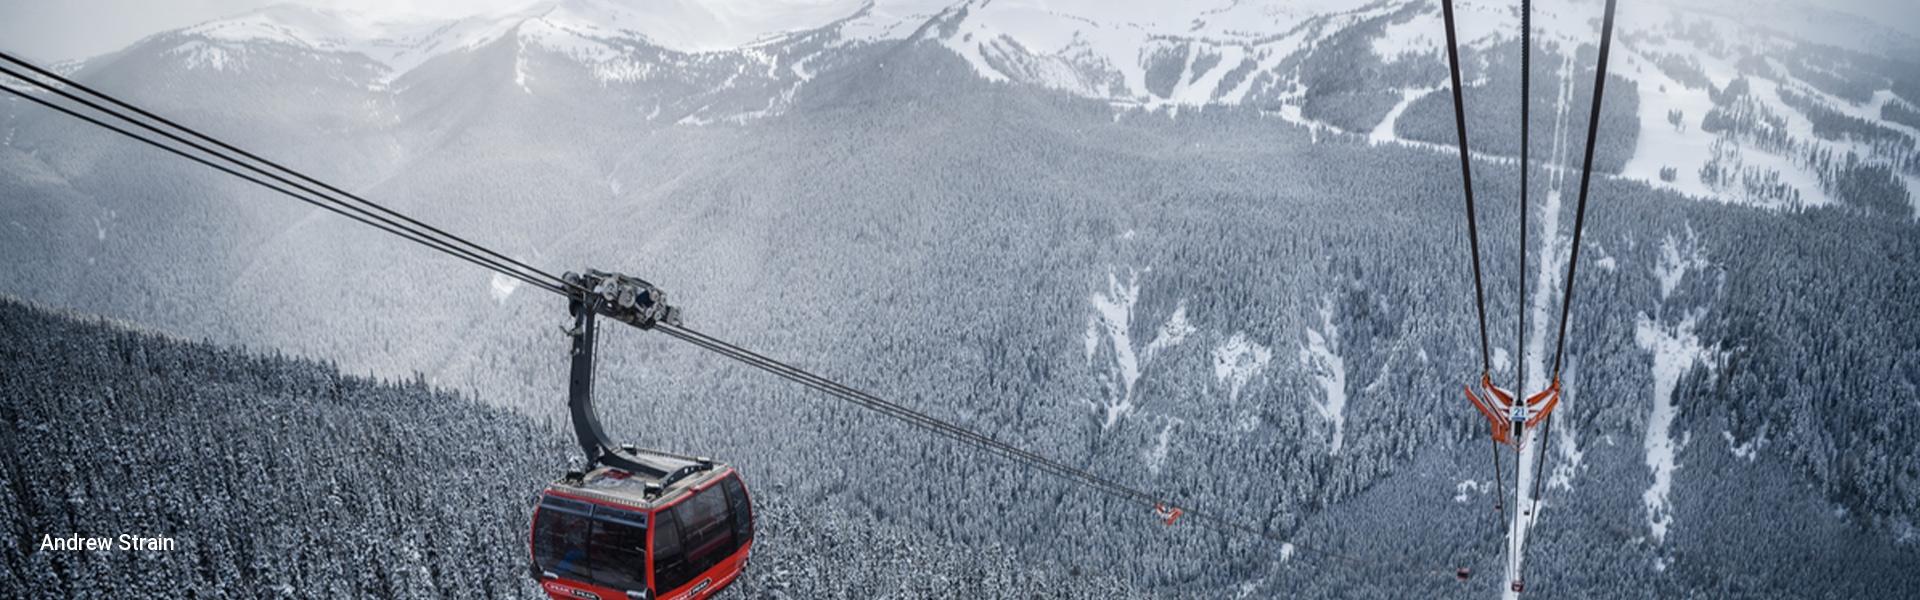 Peak 2 Peak Gondola Whistler Blackcomb